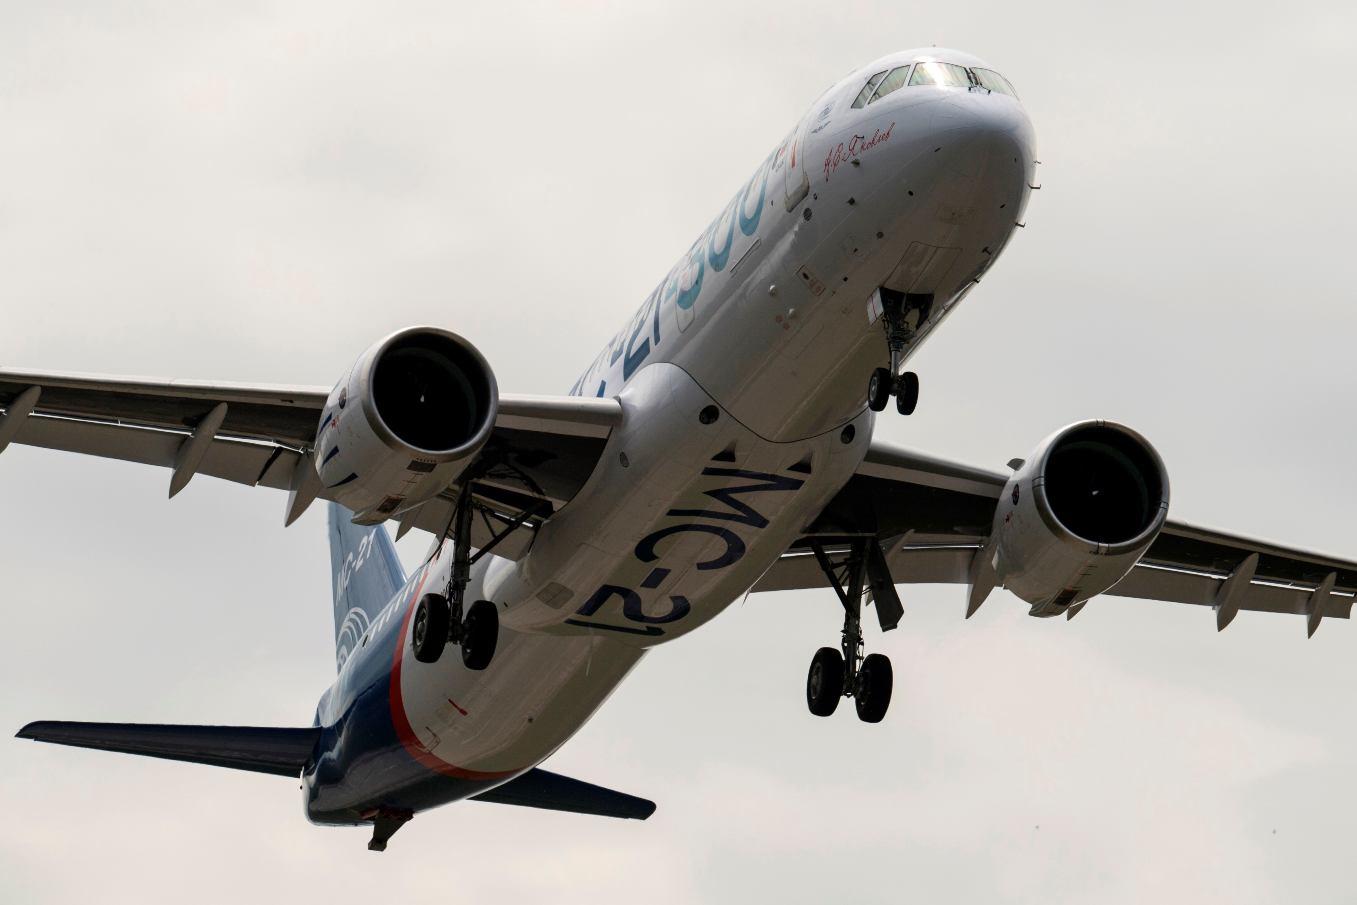 Irkut starts second stage of MC-21 flight tests